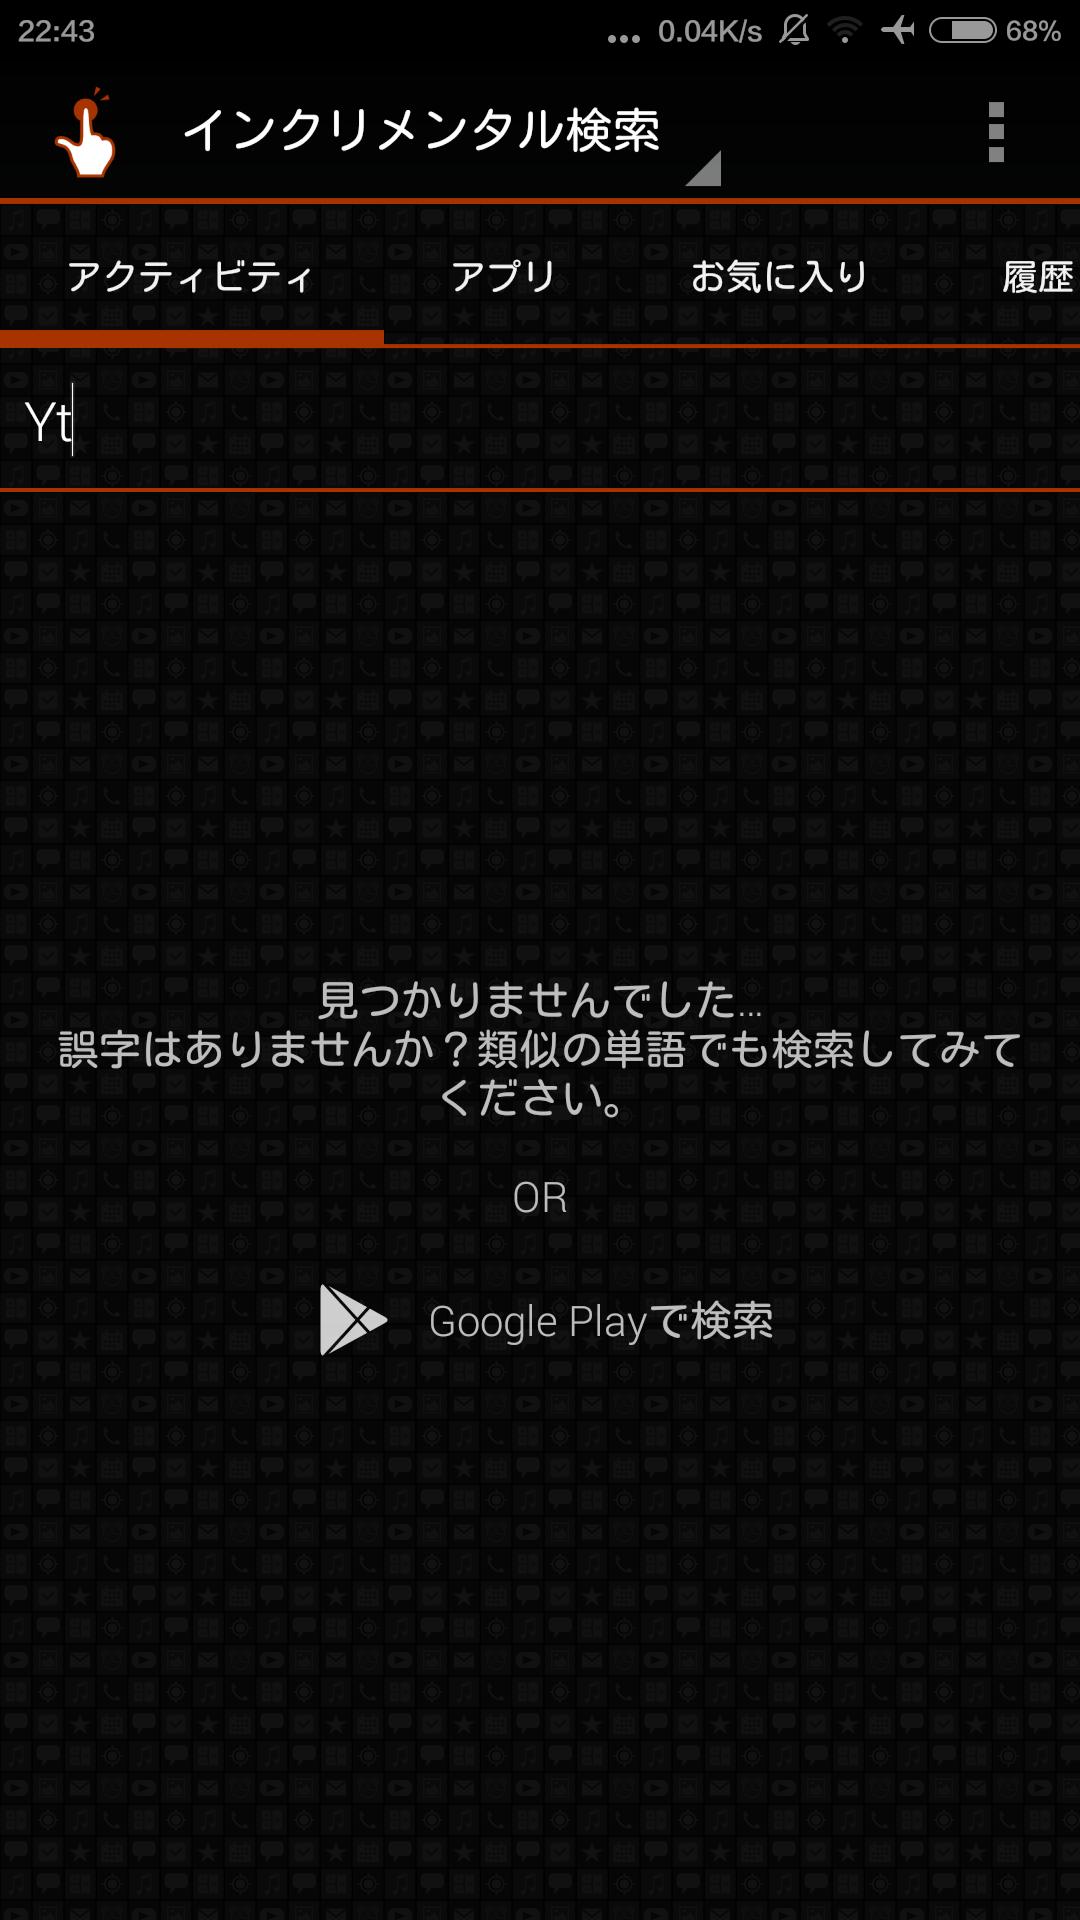 Screenshot_2015-03-09-22-43-54.png